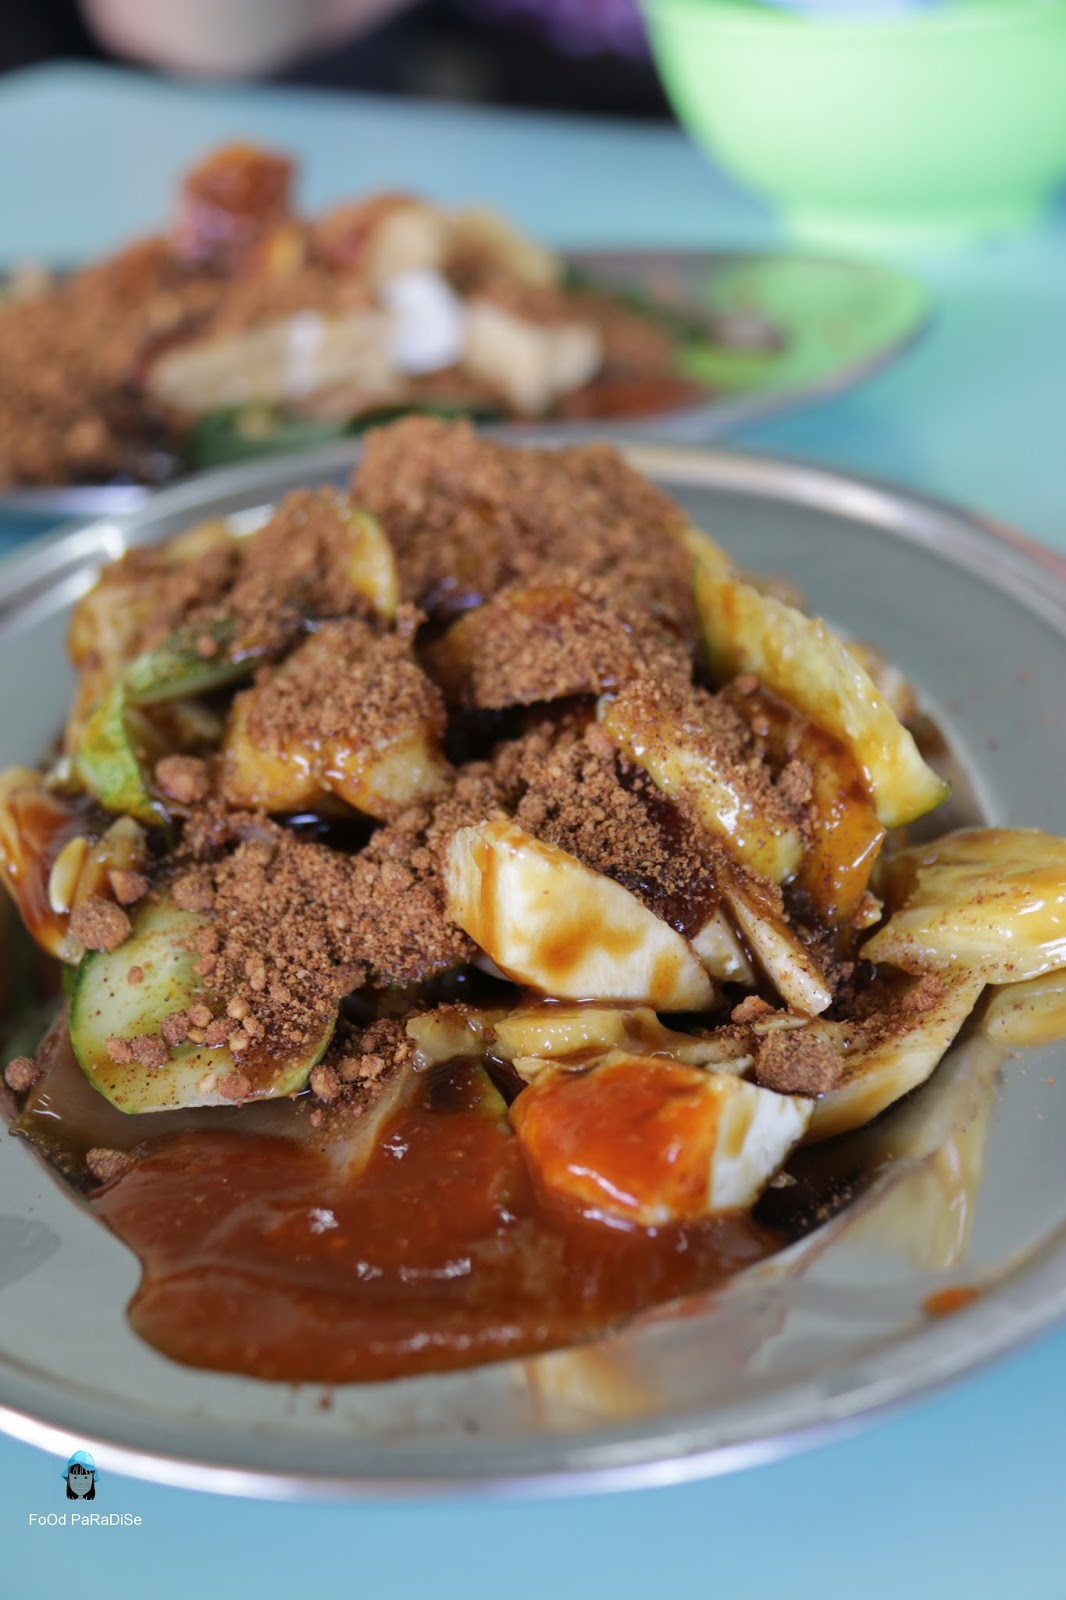 Food paradise sin wan delight rojak cold drinks jalan for X cuisine miri